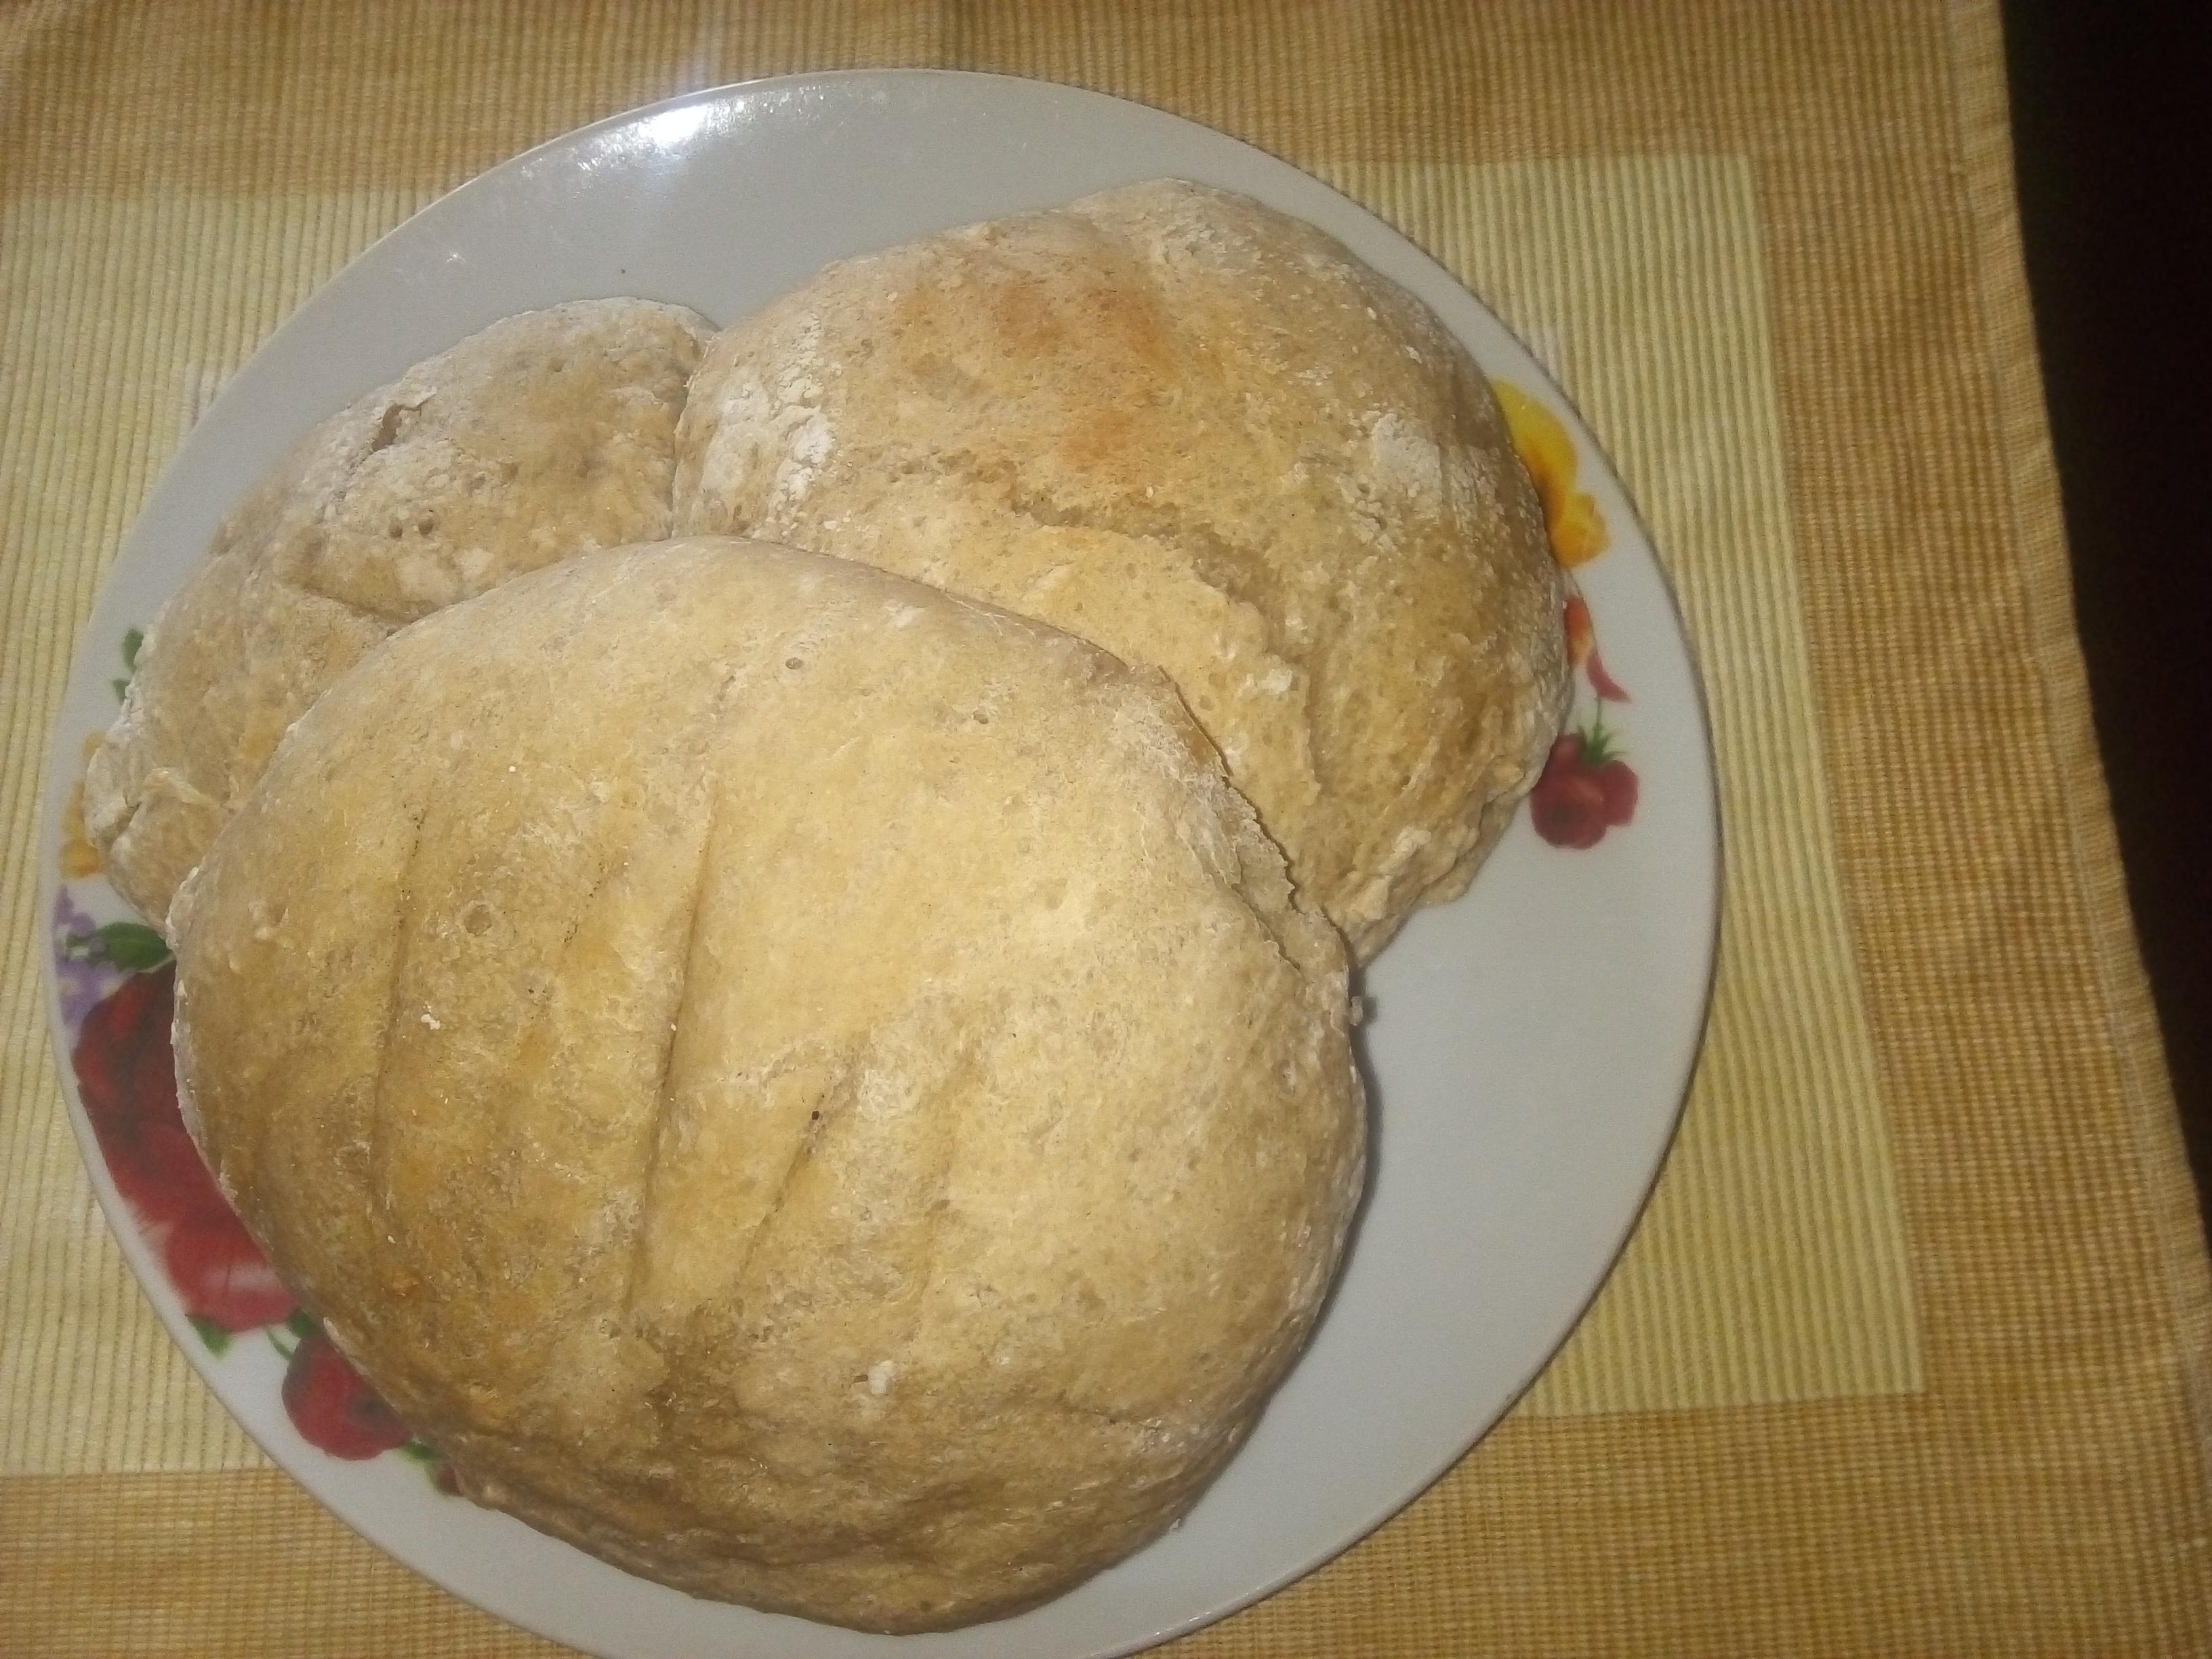 Effortless Rustic Bread Olayinka Fadare